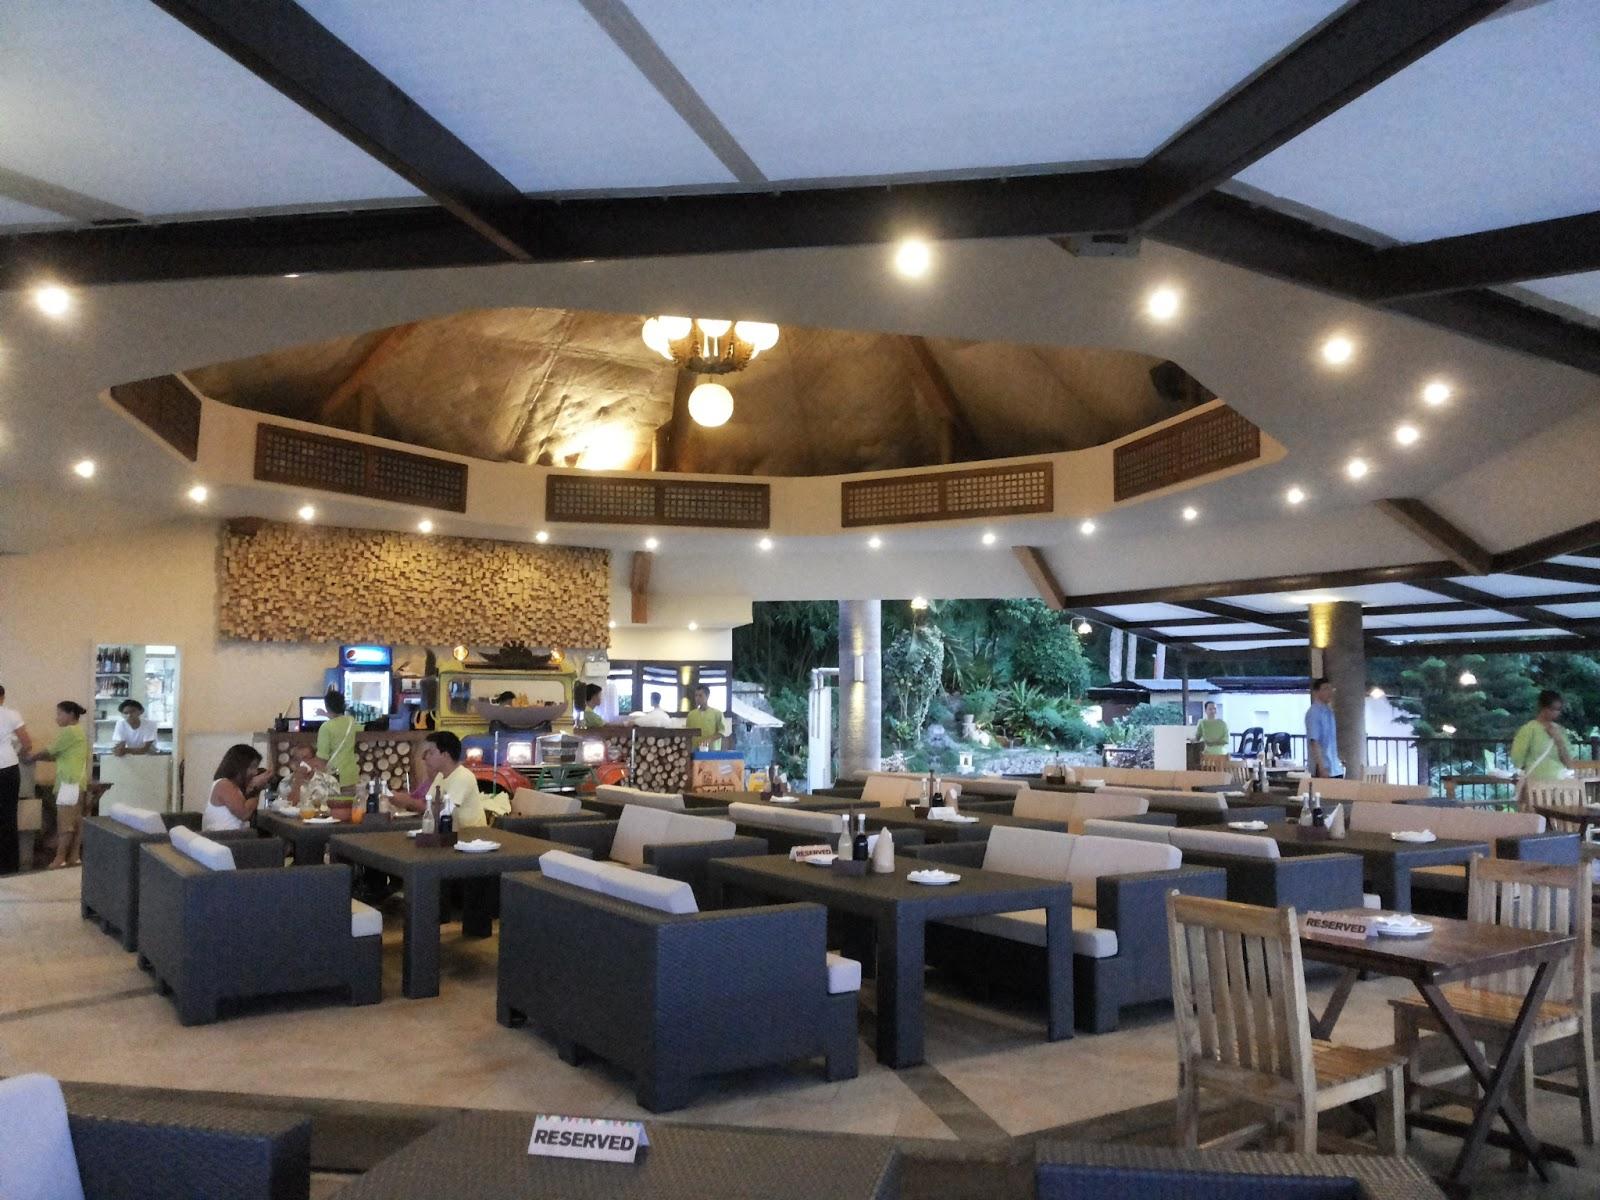 Lantaw Busay Experience Fun Dining Plus Spectacular View